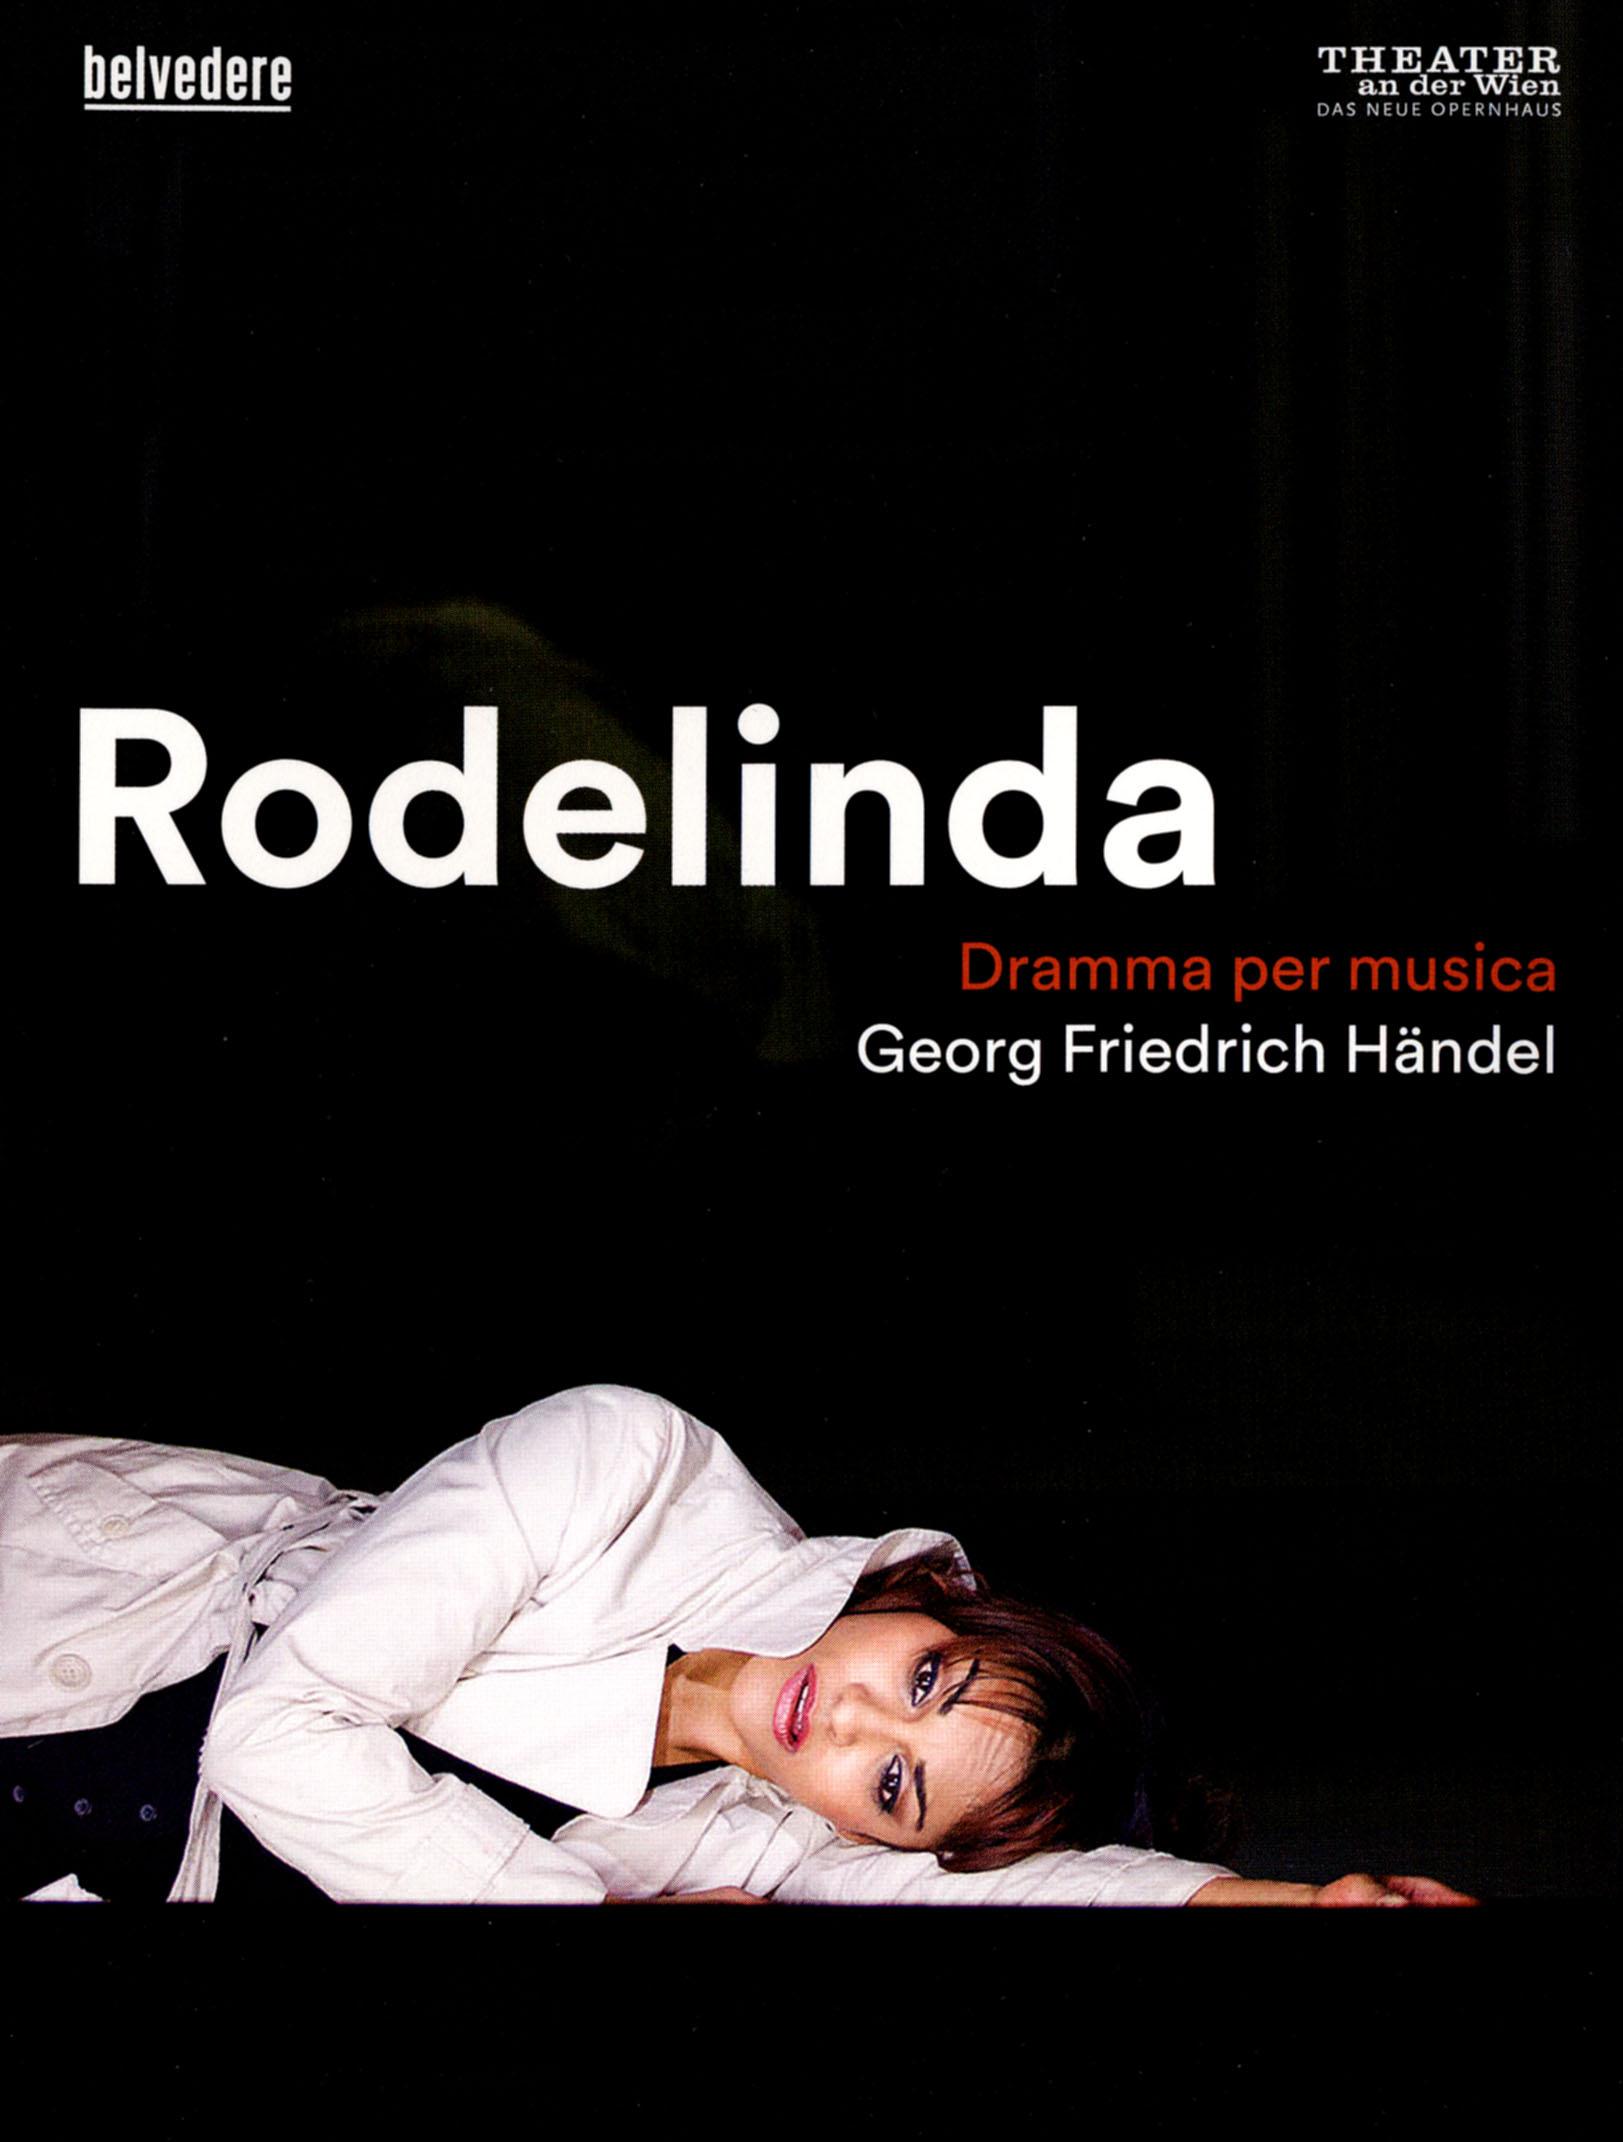 Rodelinda (Theater an der Wien)